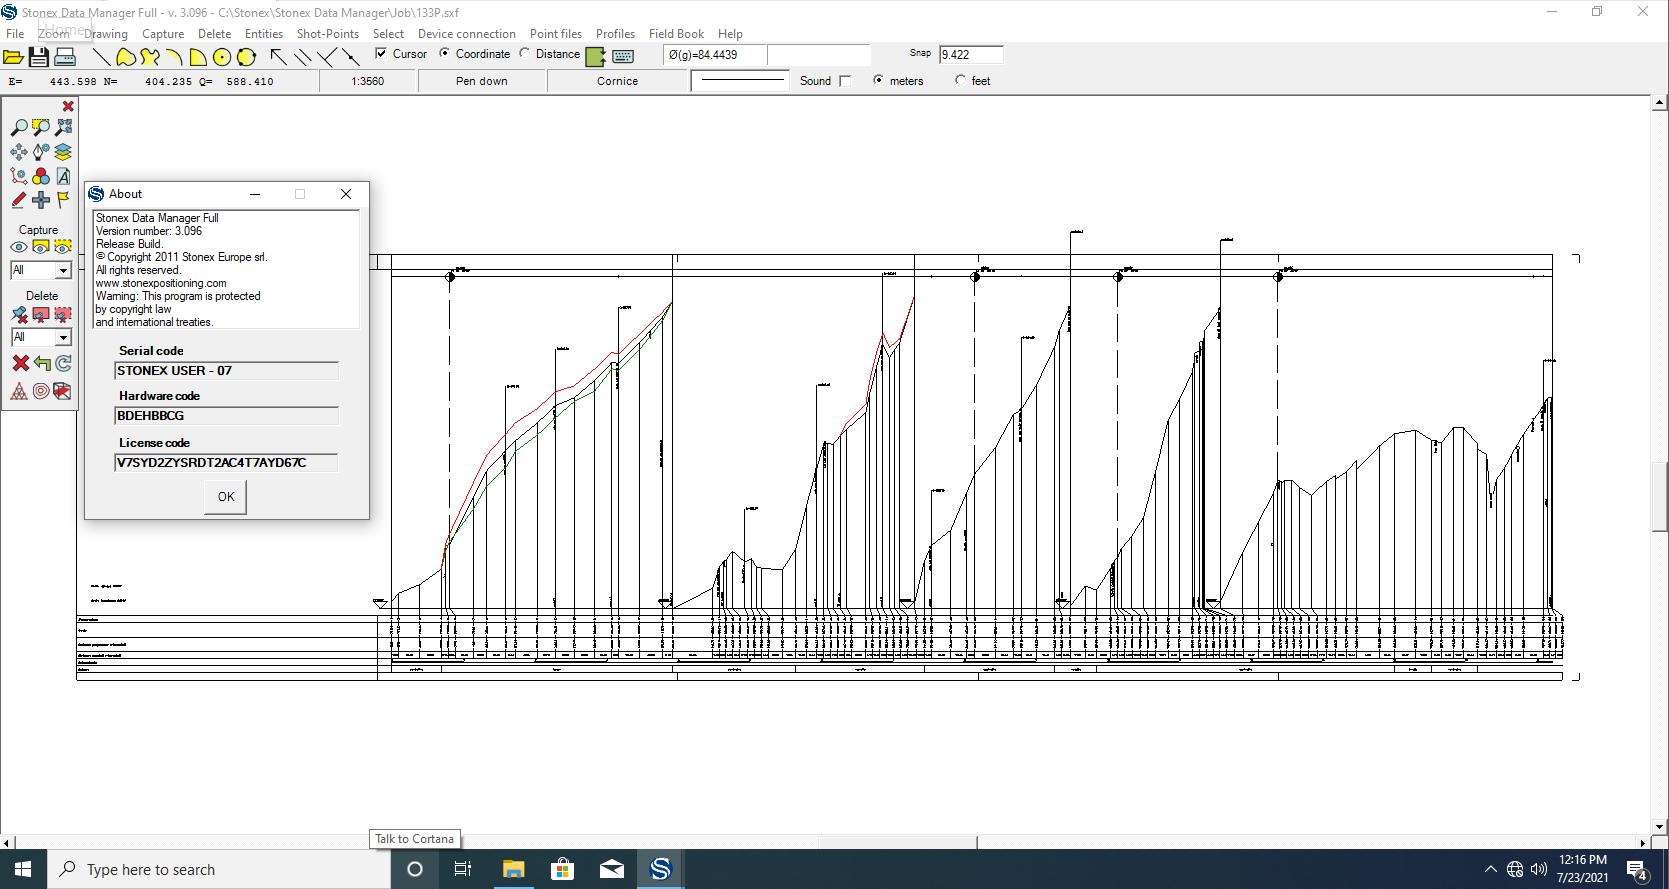 Working with Stonex Data Manager v3.096 full